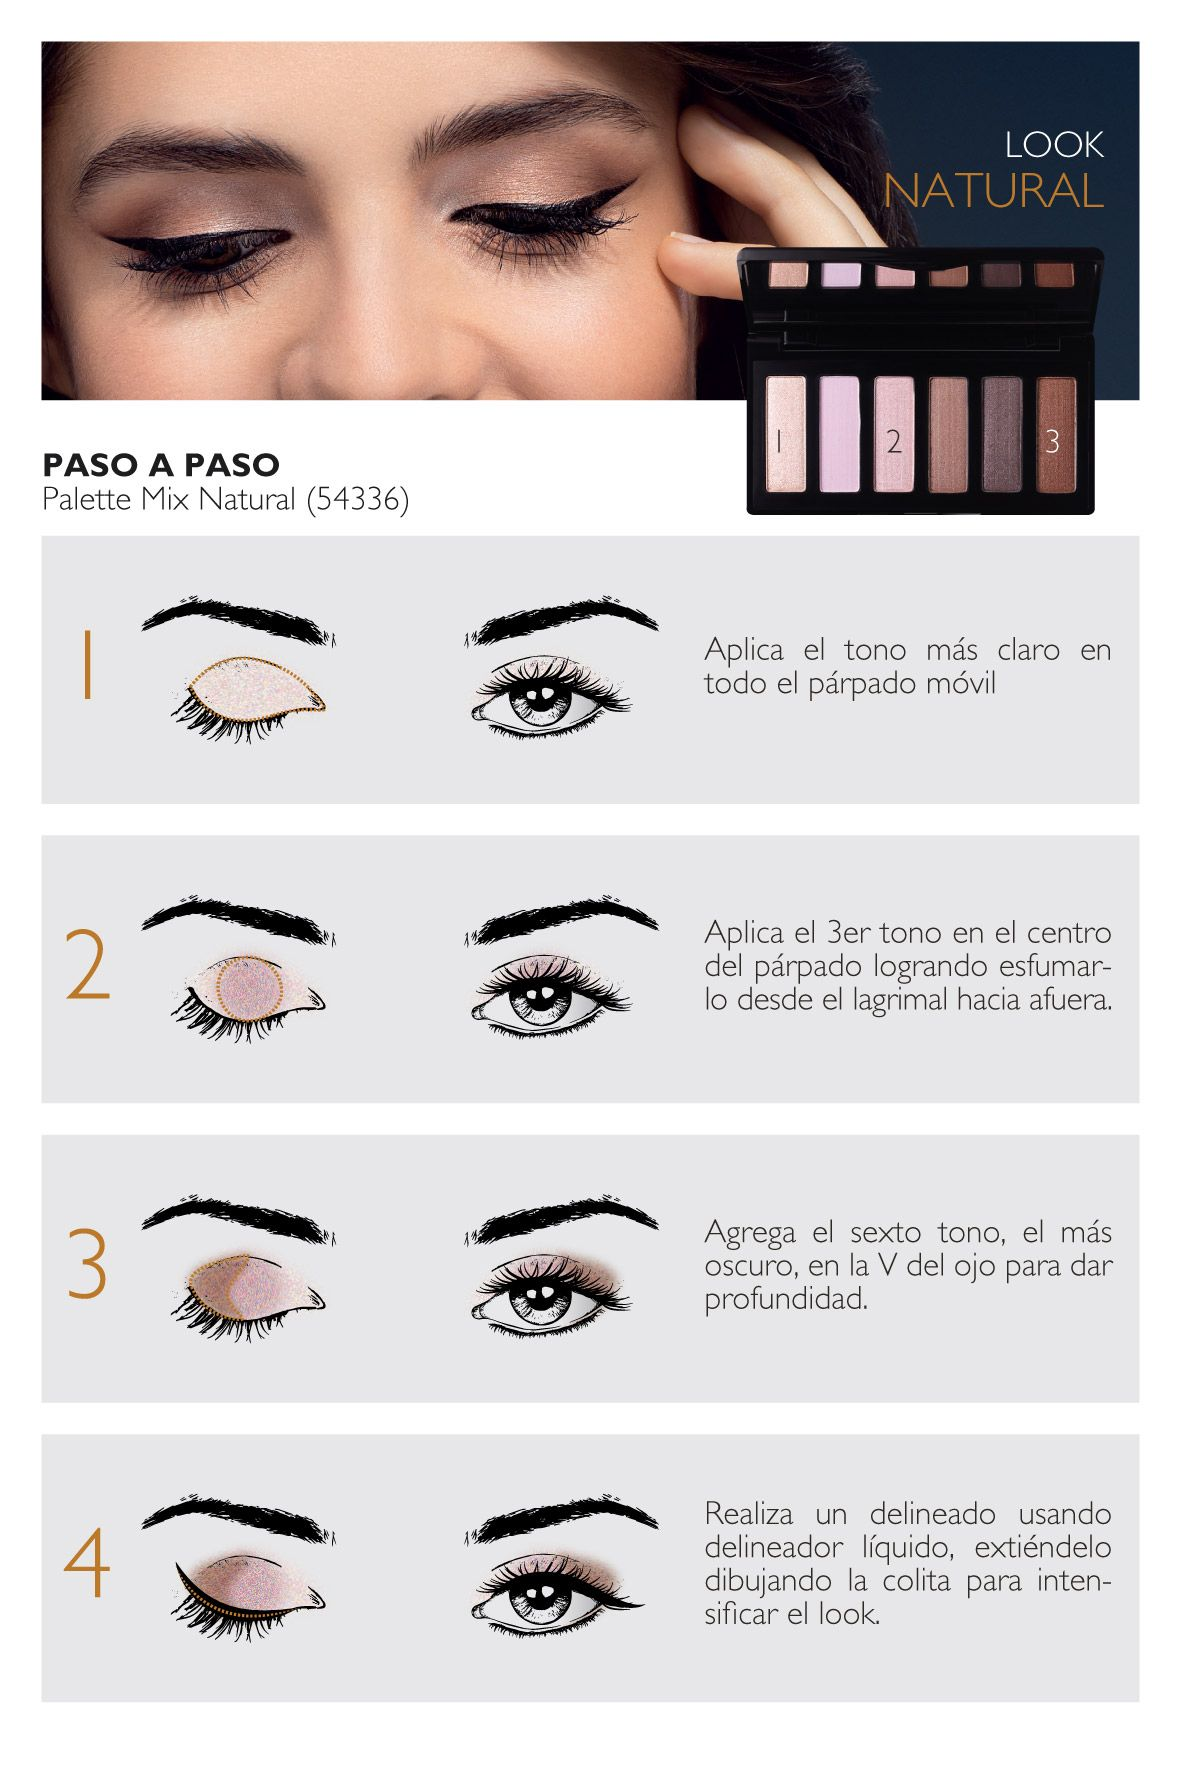 d4eef8f75 Natura cosméticos - Portal de maquillaje - Paso a Paso   Belleza ...